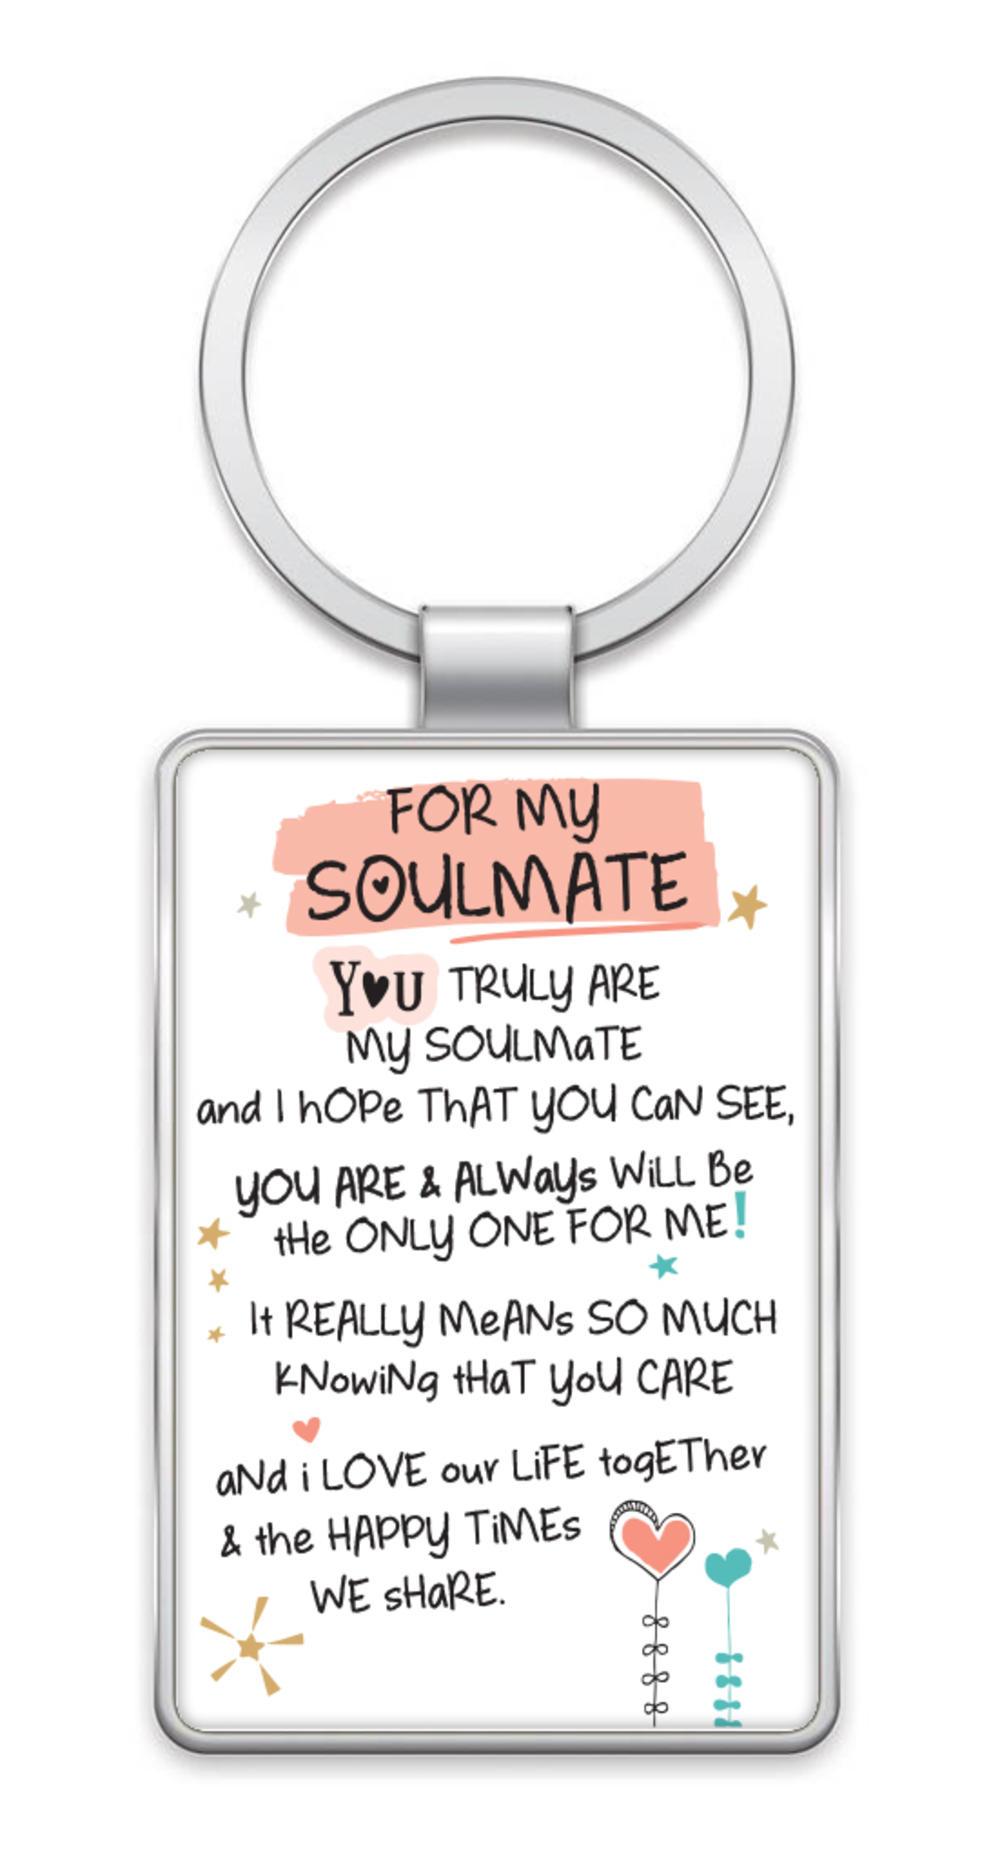 For My Soulmate Inspired Words Metal Keyring Sentimental Gift Range